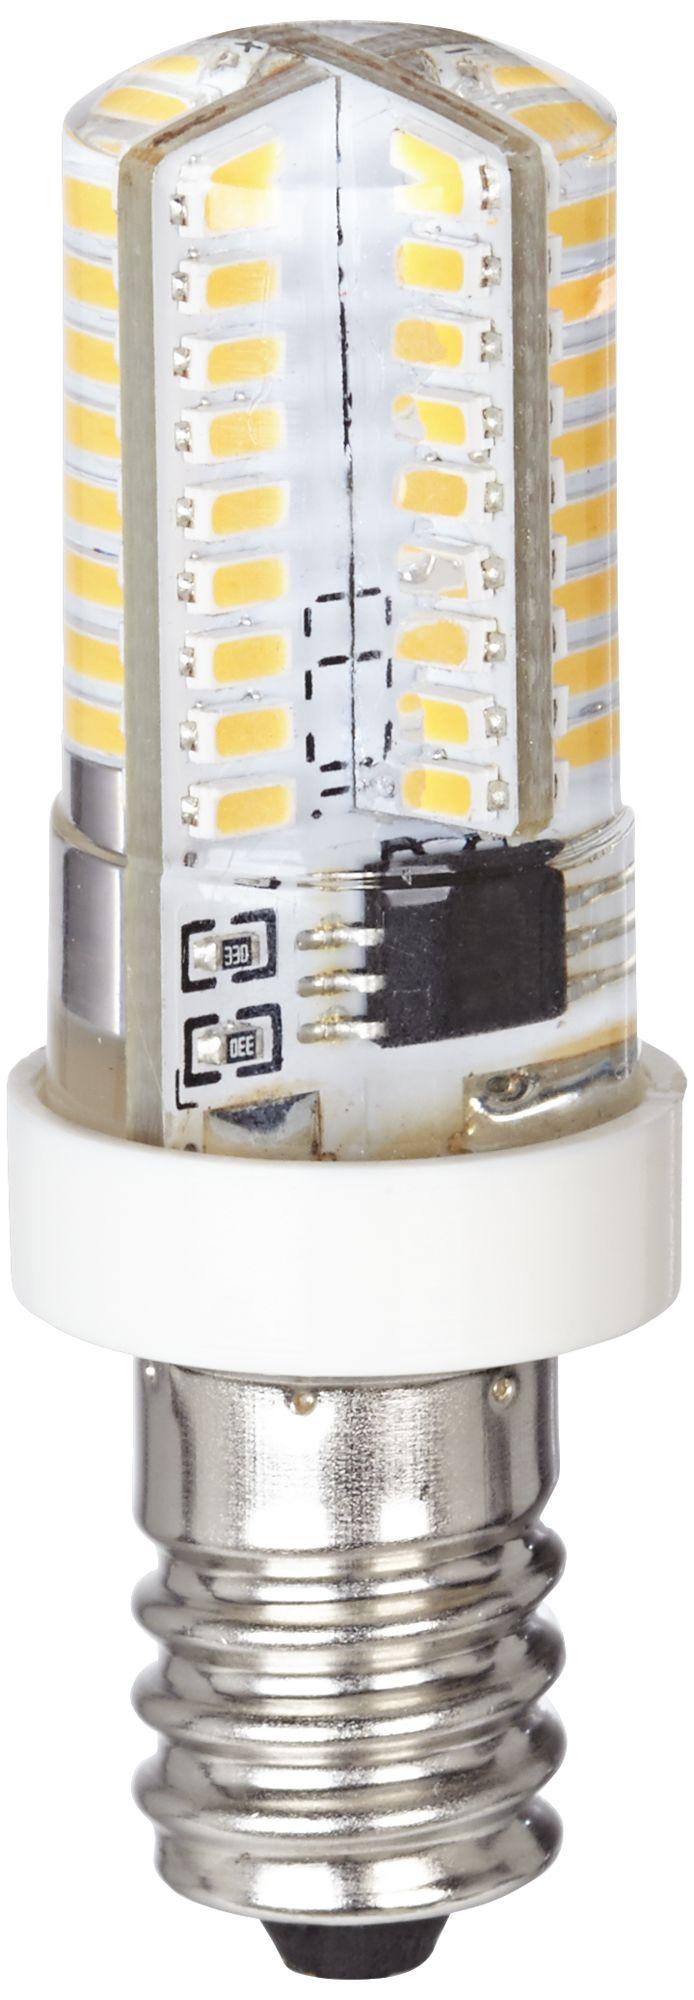 40 watt equivalent clear 4 watt led e12 minican tube bulb